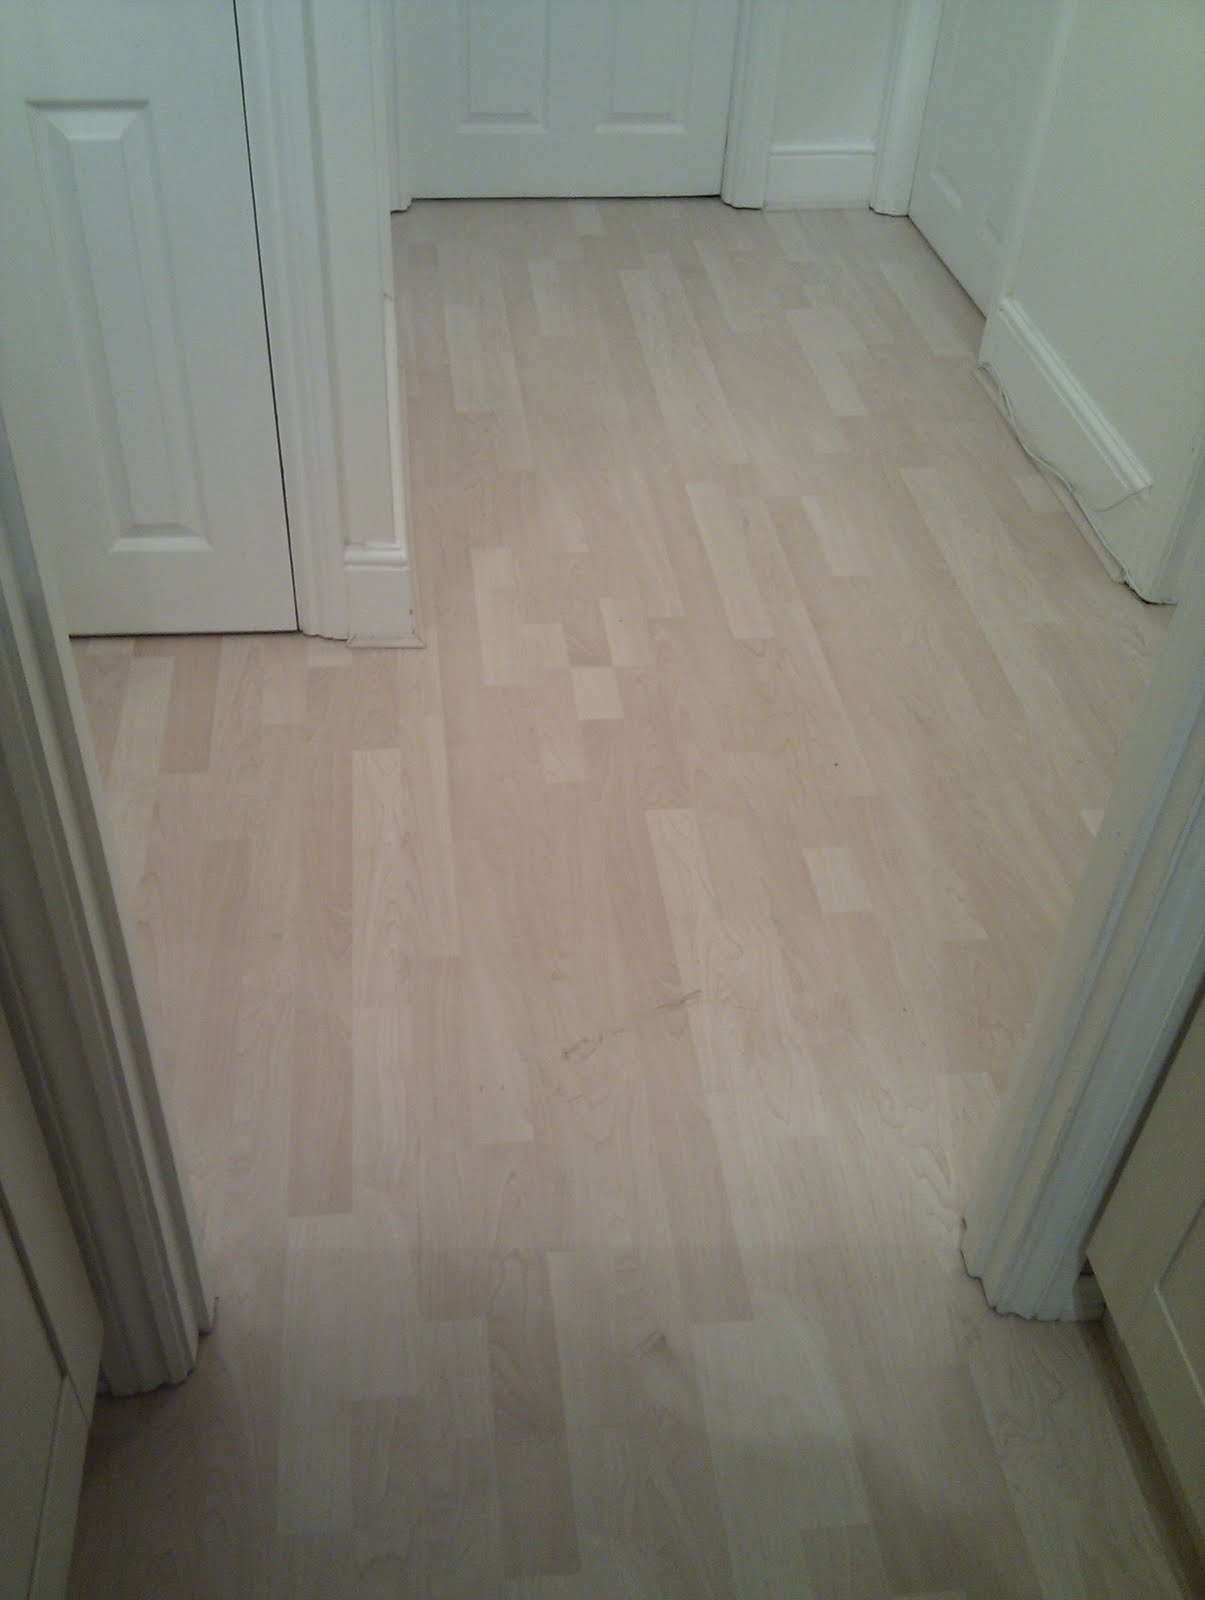 Bathroom Laminate Flooring: TOM FLOORING: Ealing Laminate Wood Flooring, Kitchen